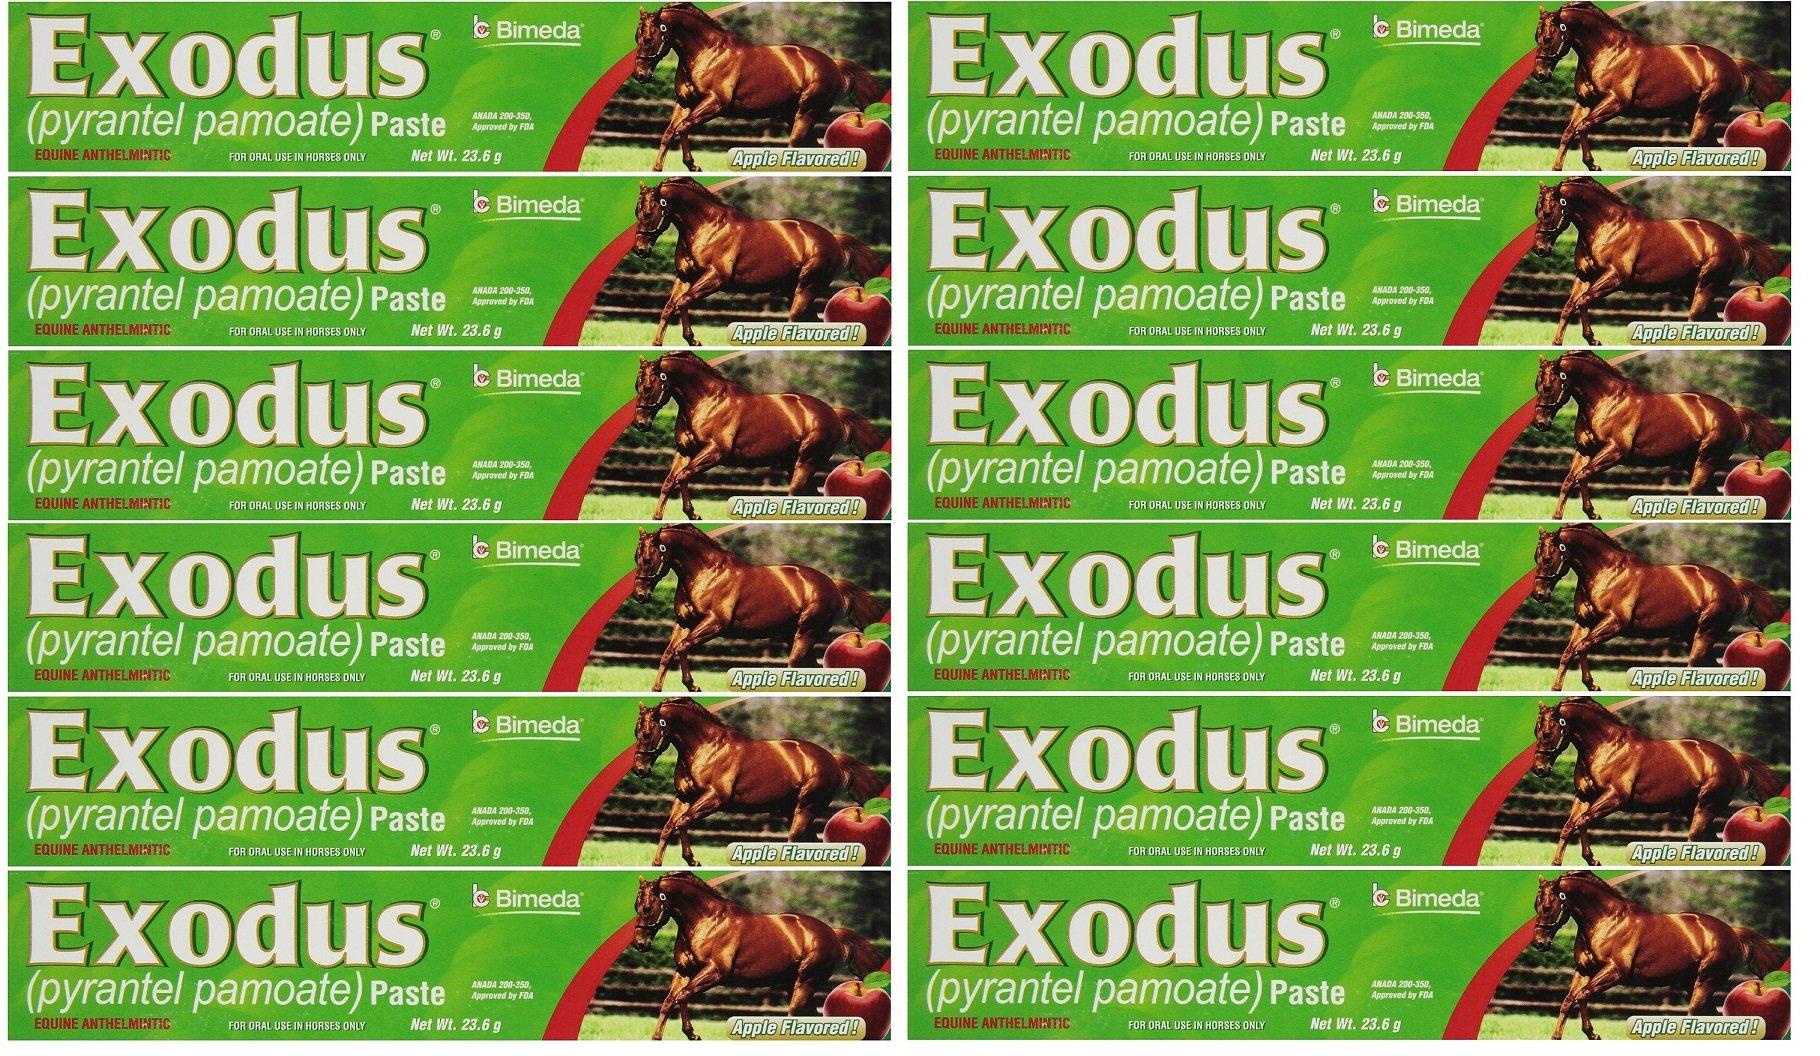 BIMEDA Pyrantel Paste Horse 23.6g wormer Equine Parasite Exodus (Pamoate Strongid) OTC 12 Pack by BIMEDA